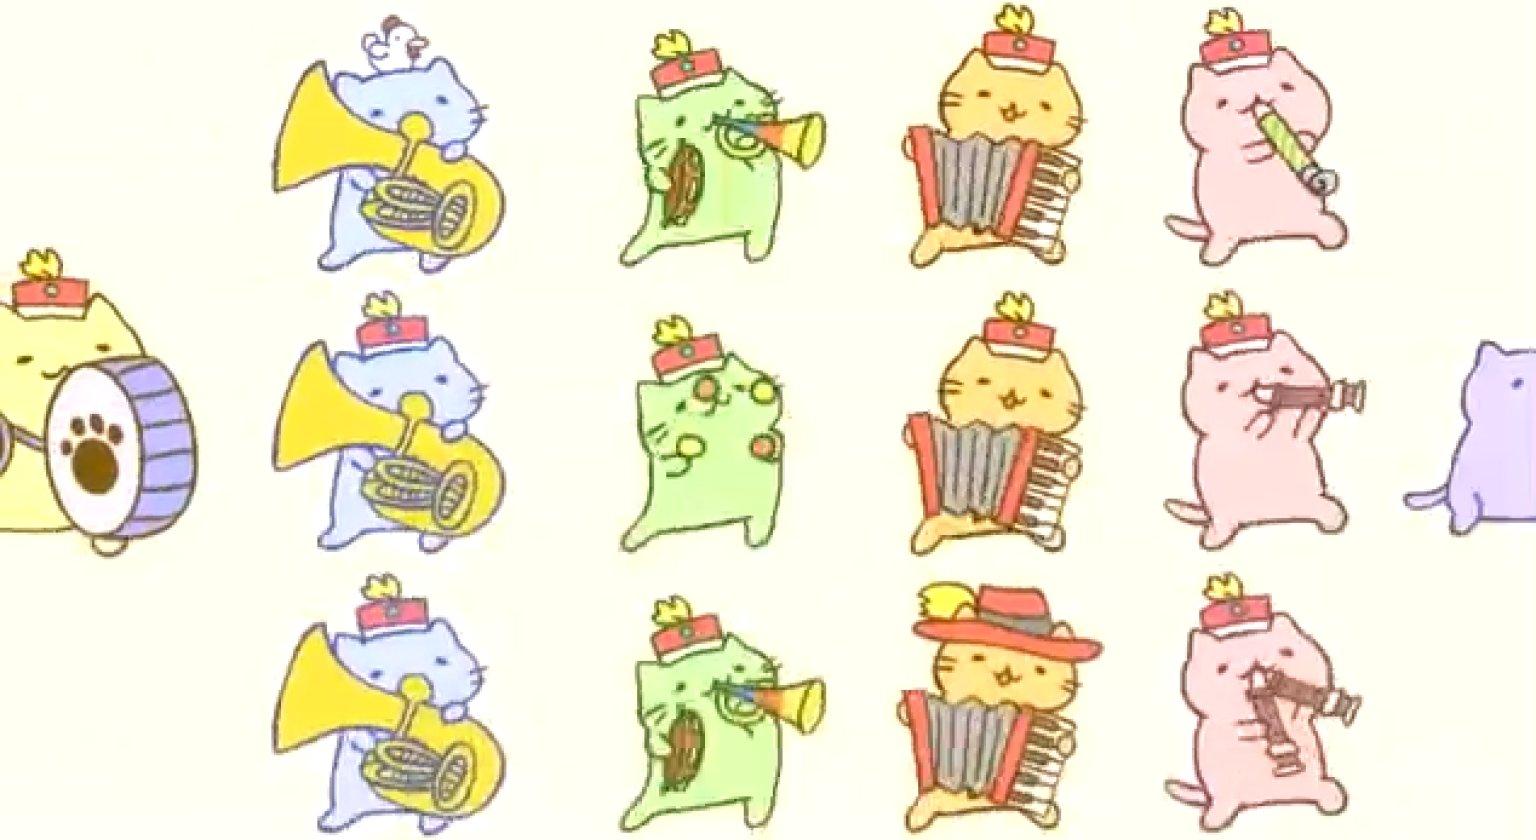 Cute Japanese Cat Wallpaper Mitchiri Neko Cat March The Most Delightful Thing You